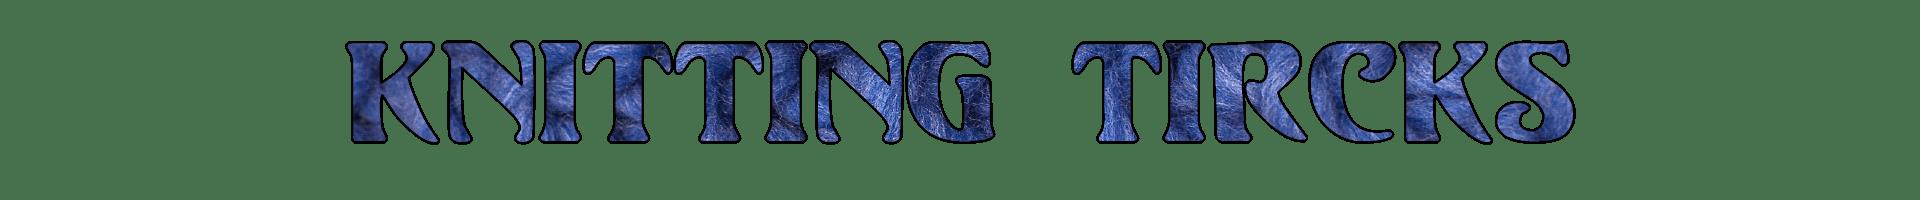 Title- Knitting Tricks- Blue